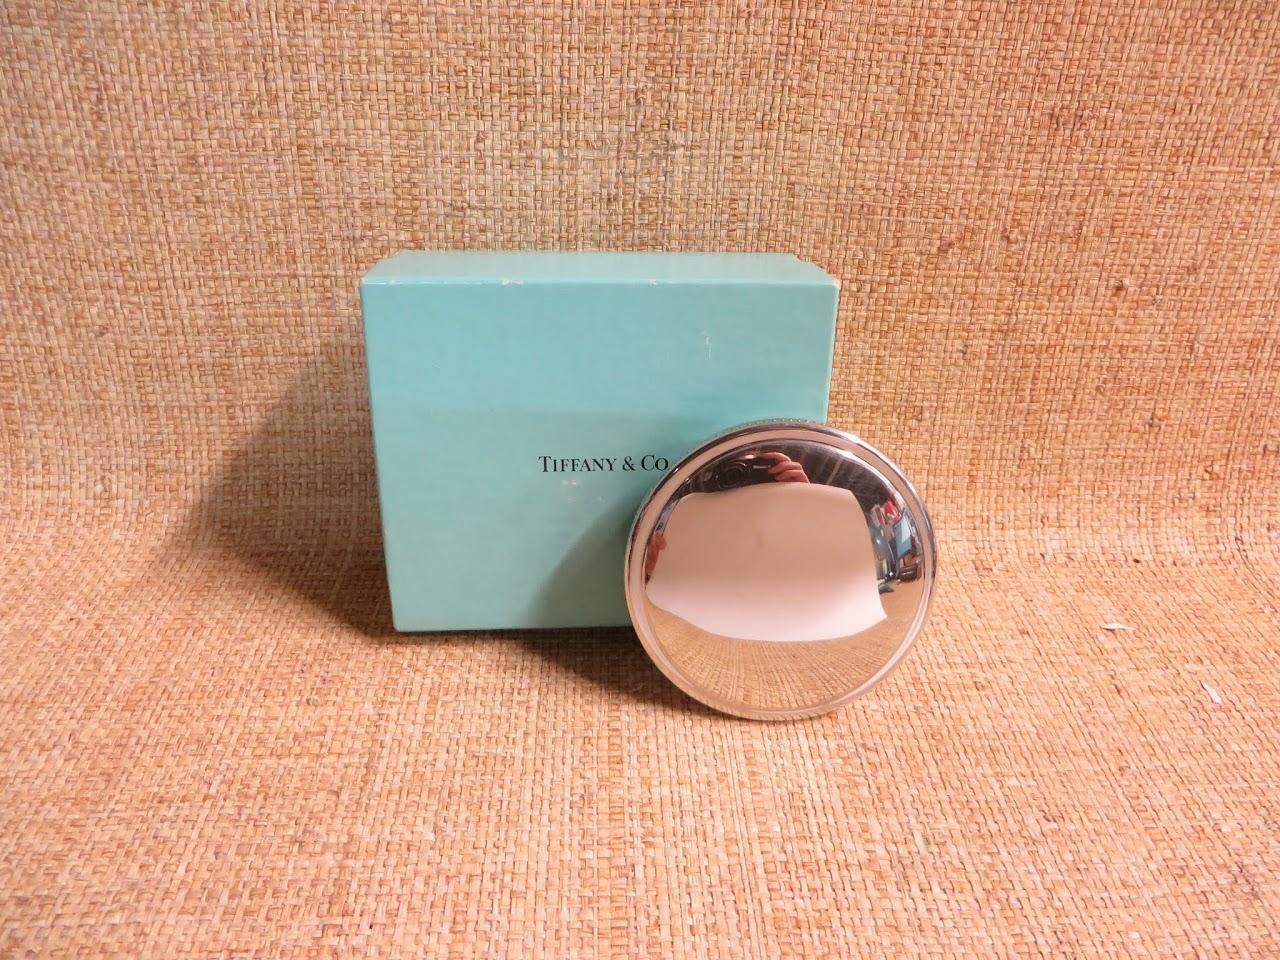 Tiffany & Co. Pewter Trinket Box